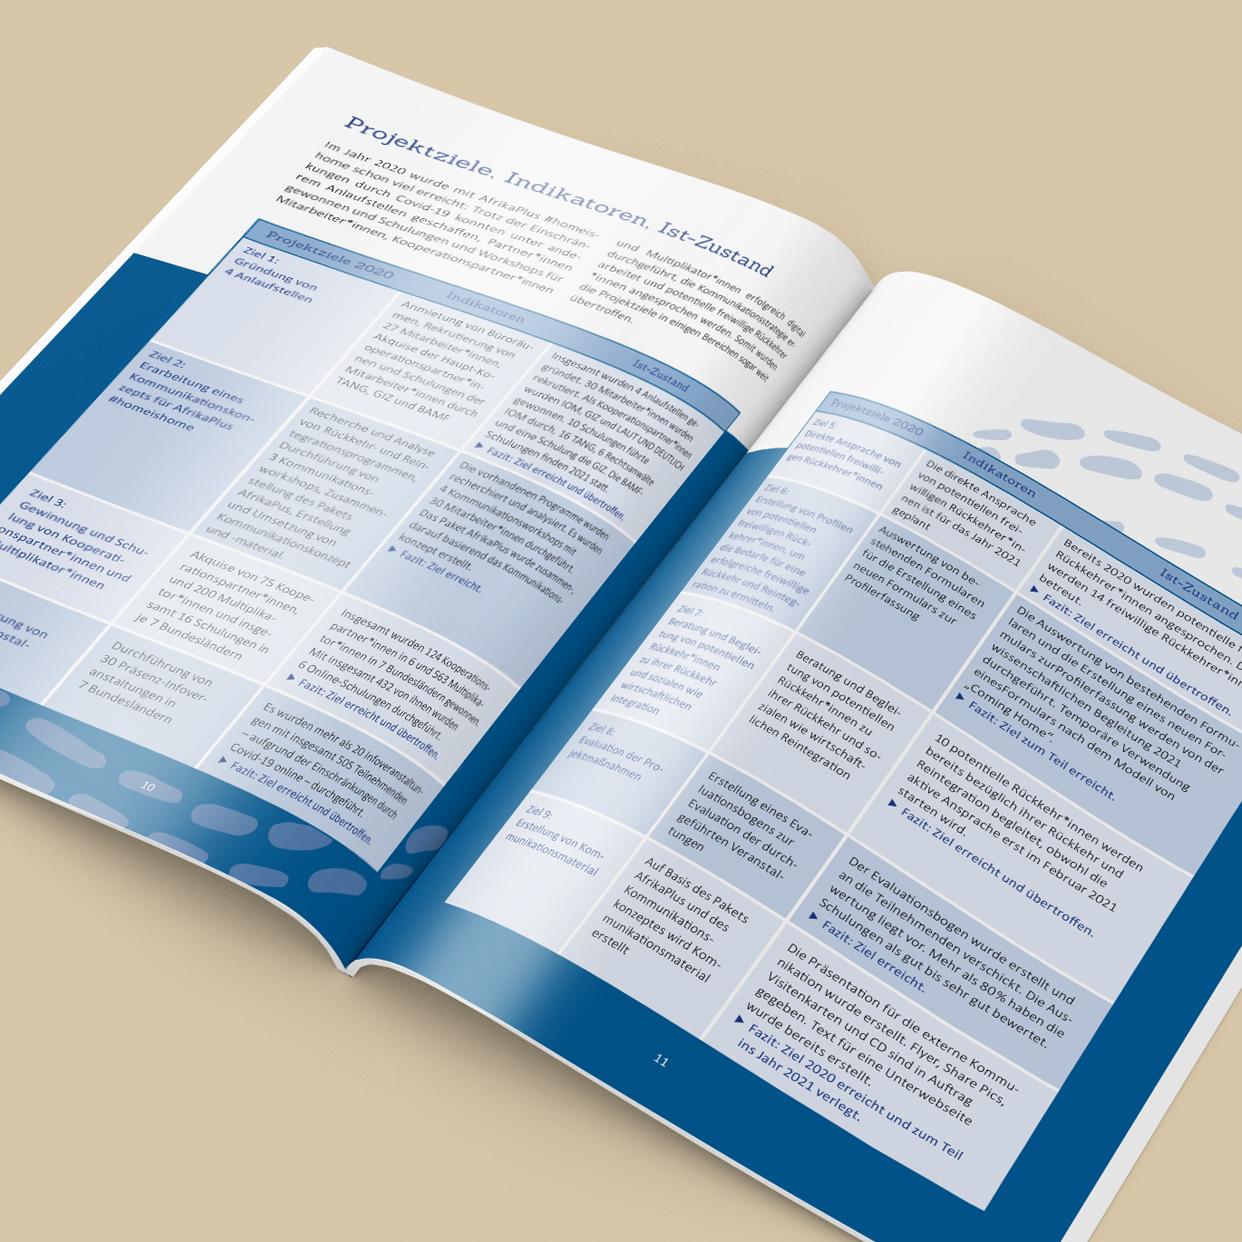 TANG-AfrikaPlus-brochure-inside_2